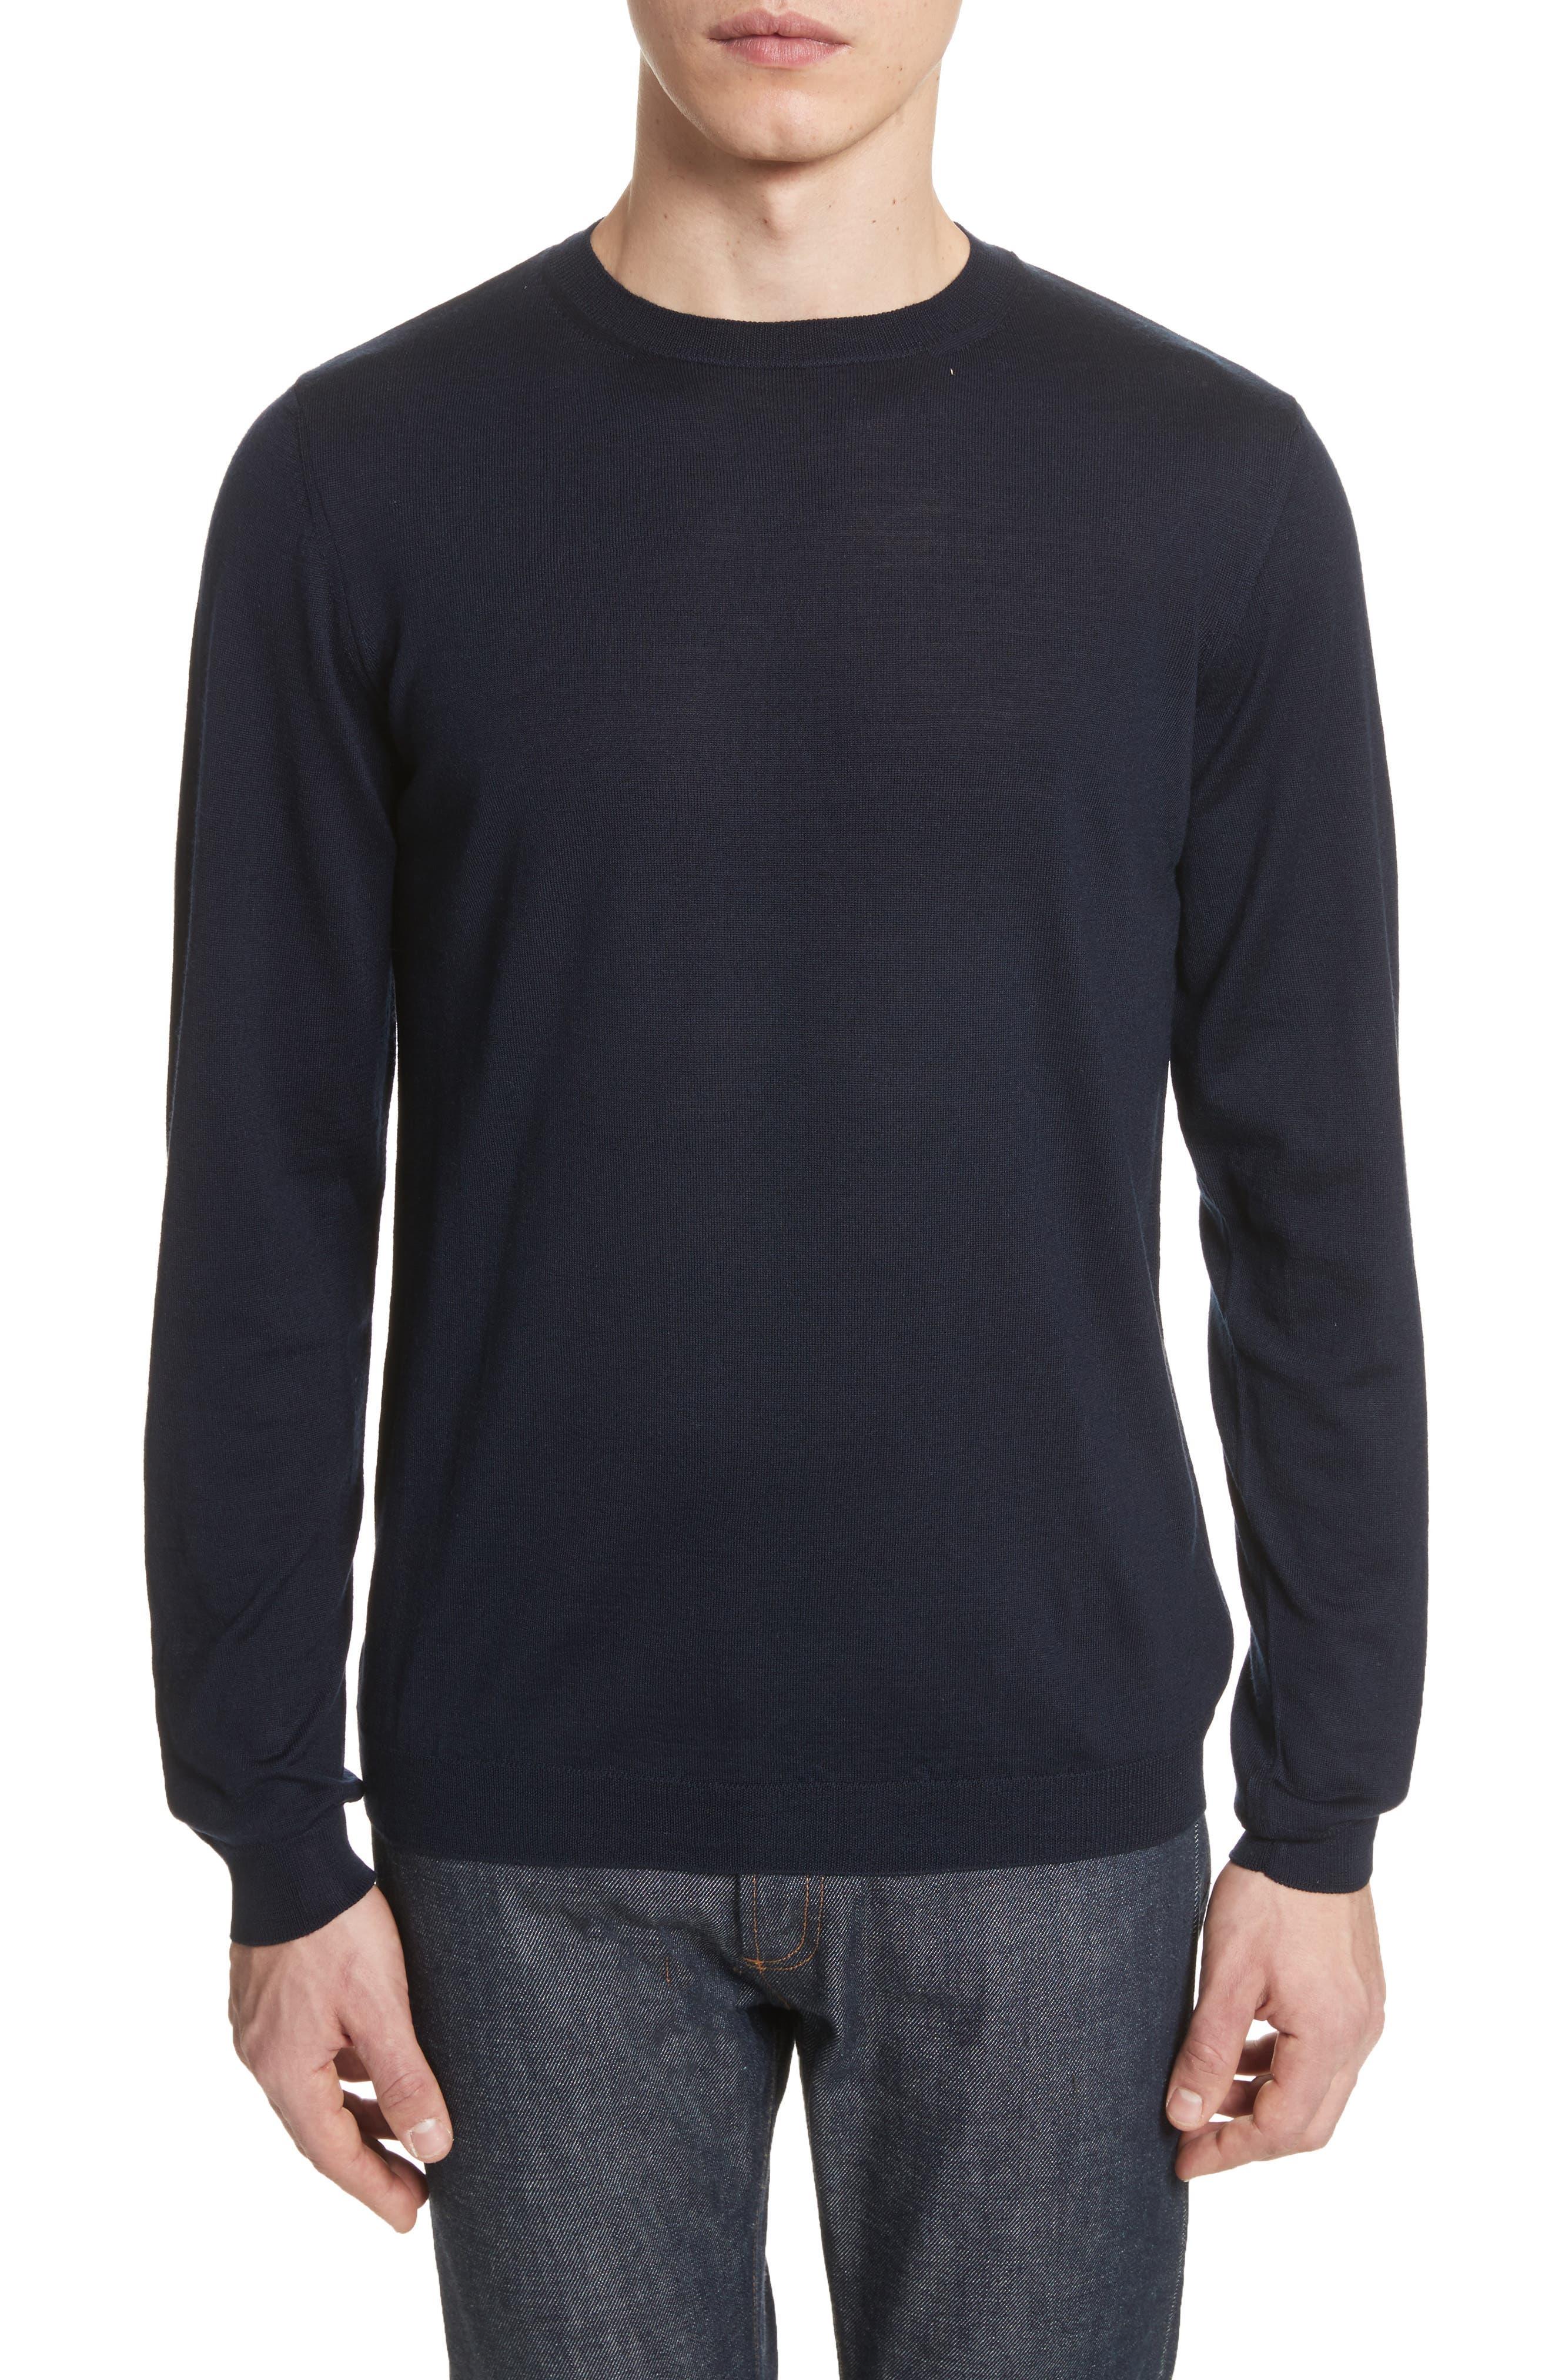 Sigfred Merino Wool & Silk Crewneck Sweater,                         Main,                         color, Dark Navy